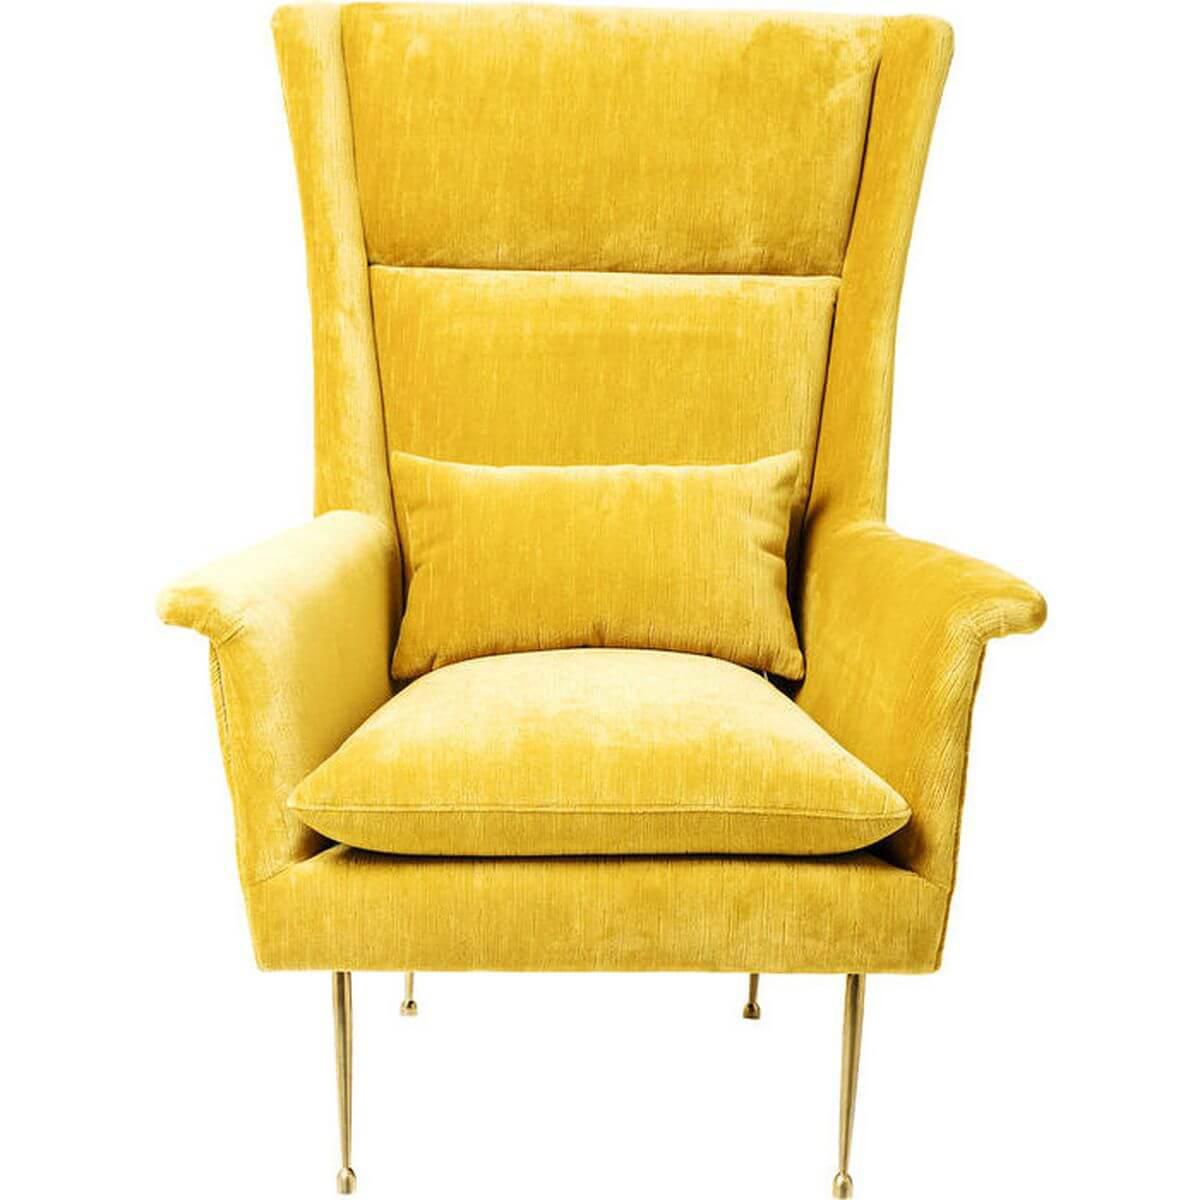 Fauteuil Vegas Forever Kare Design  jaune